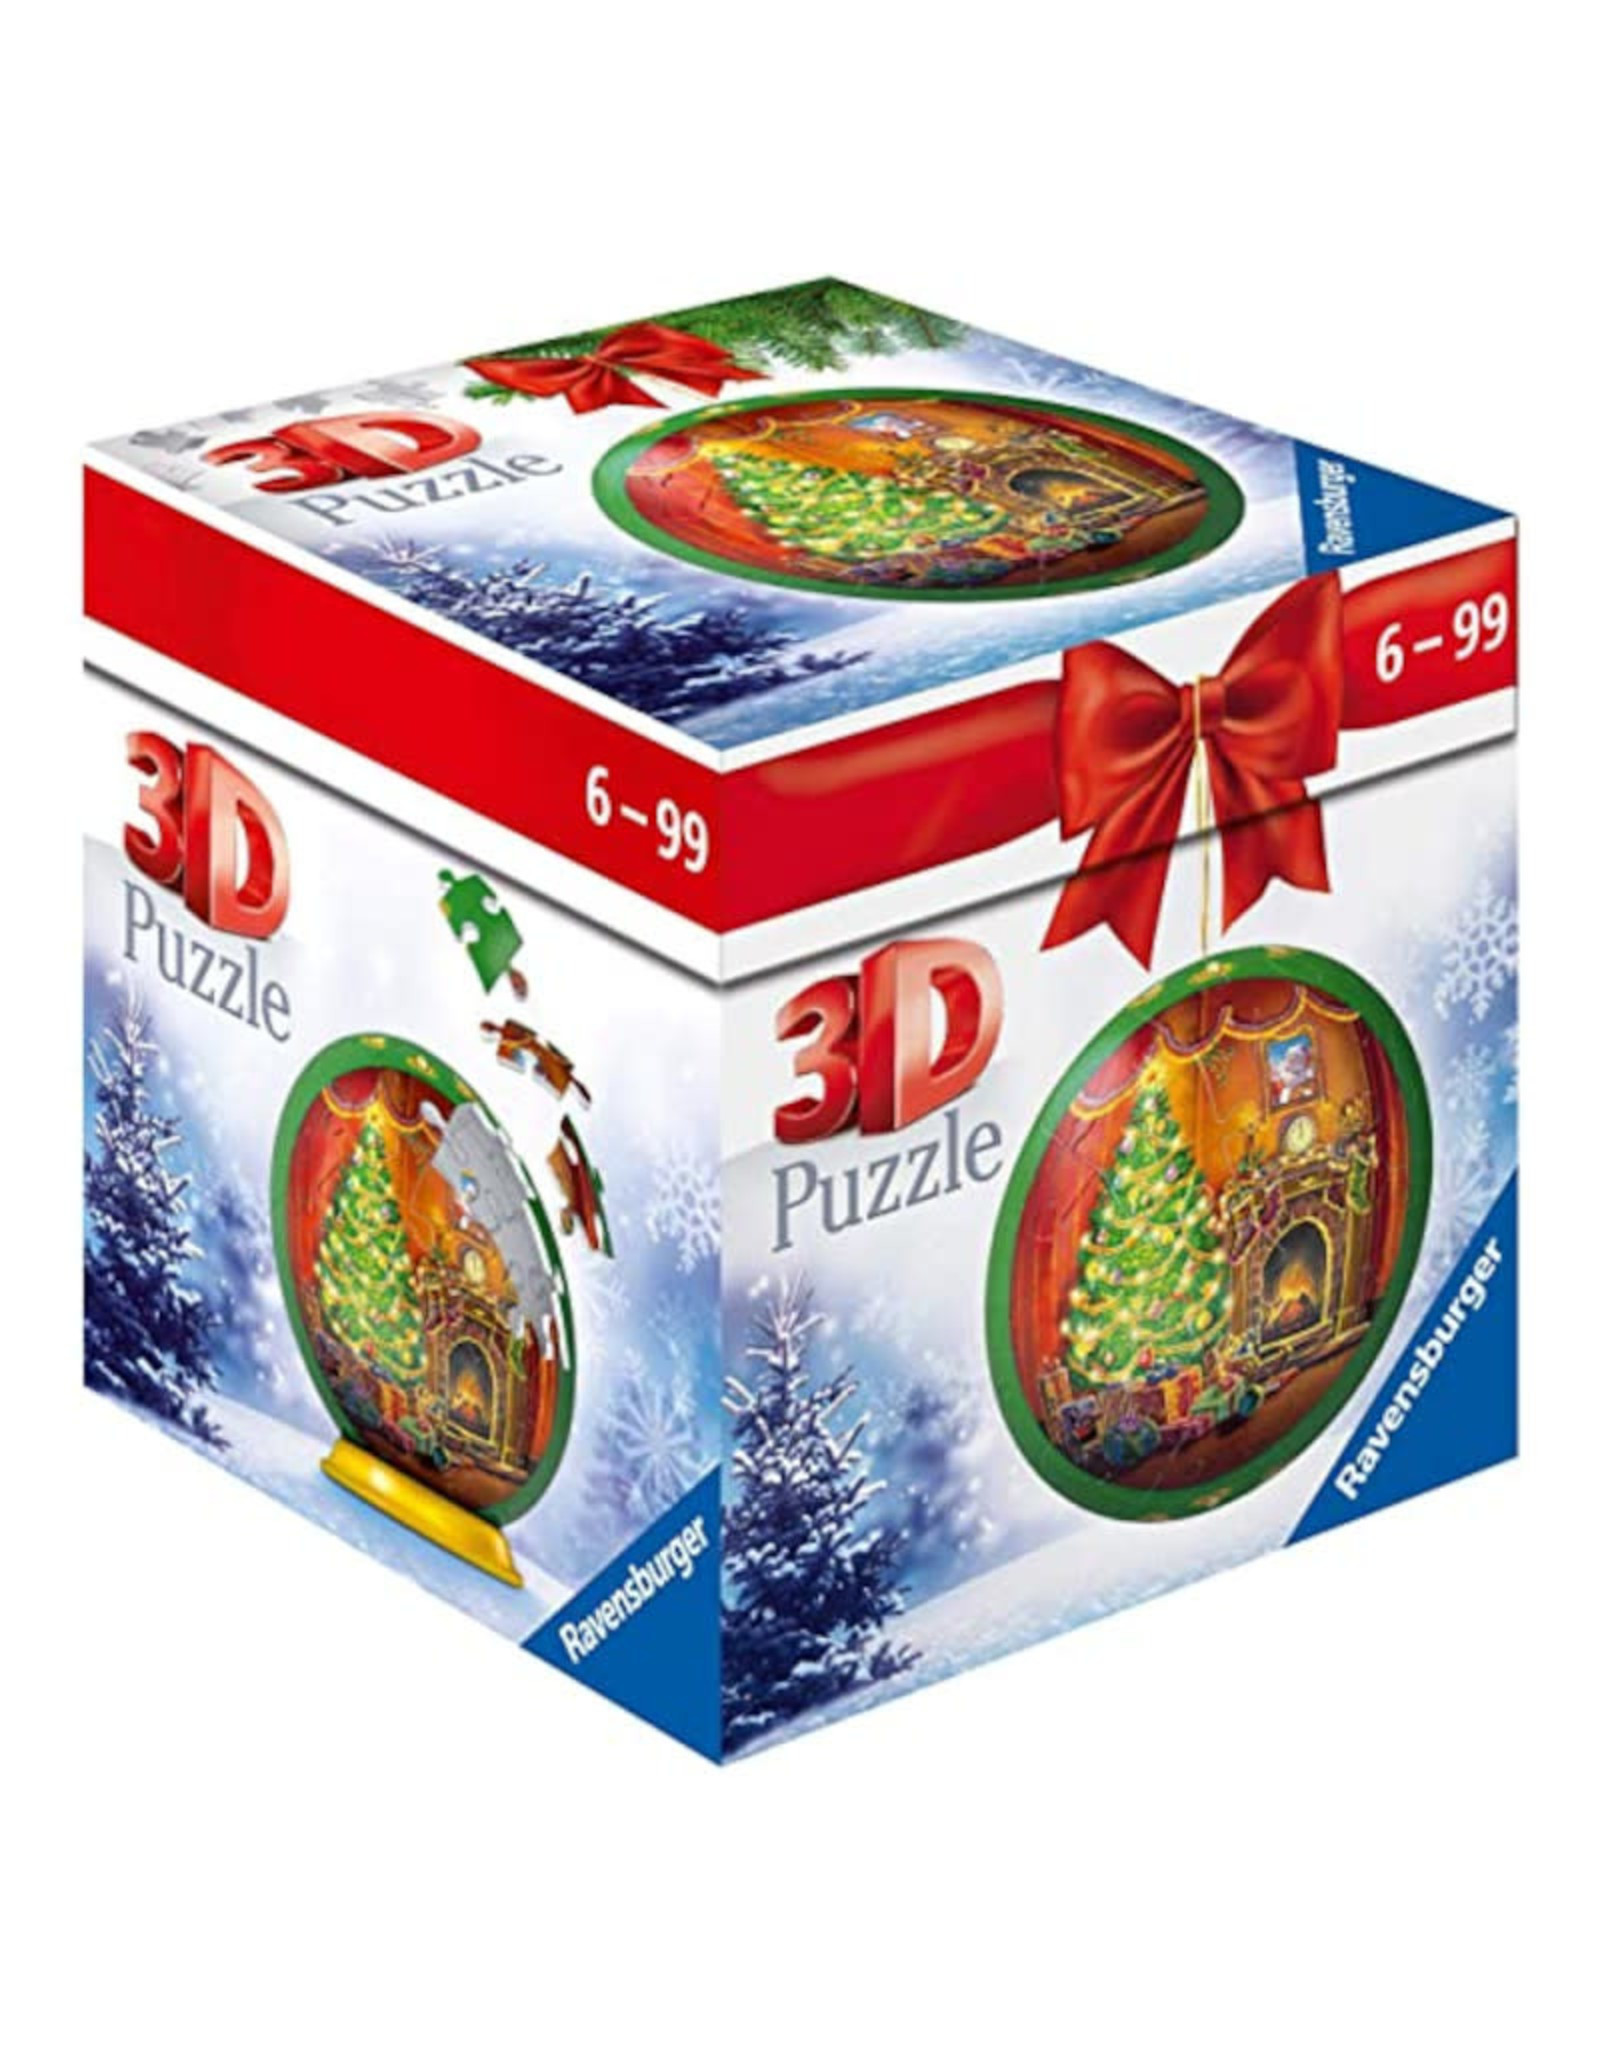 Ravensburger Snow Globe 3D Puzzle 56 PCS